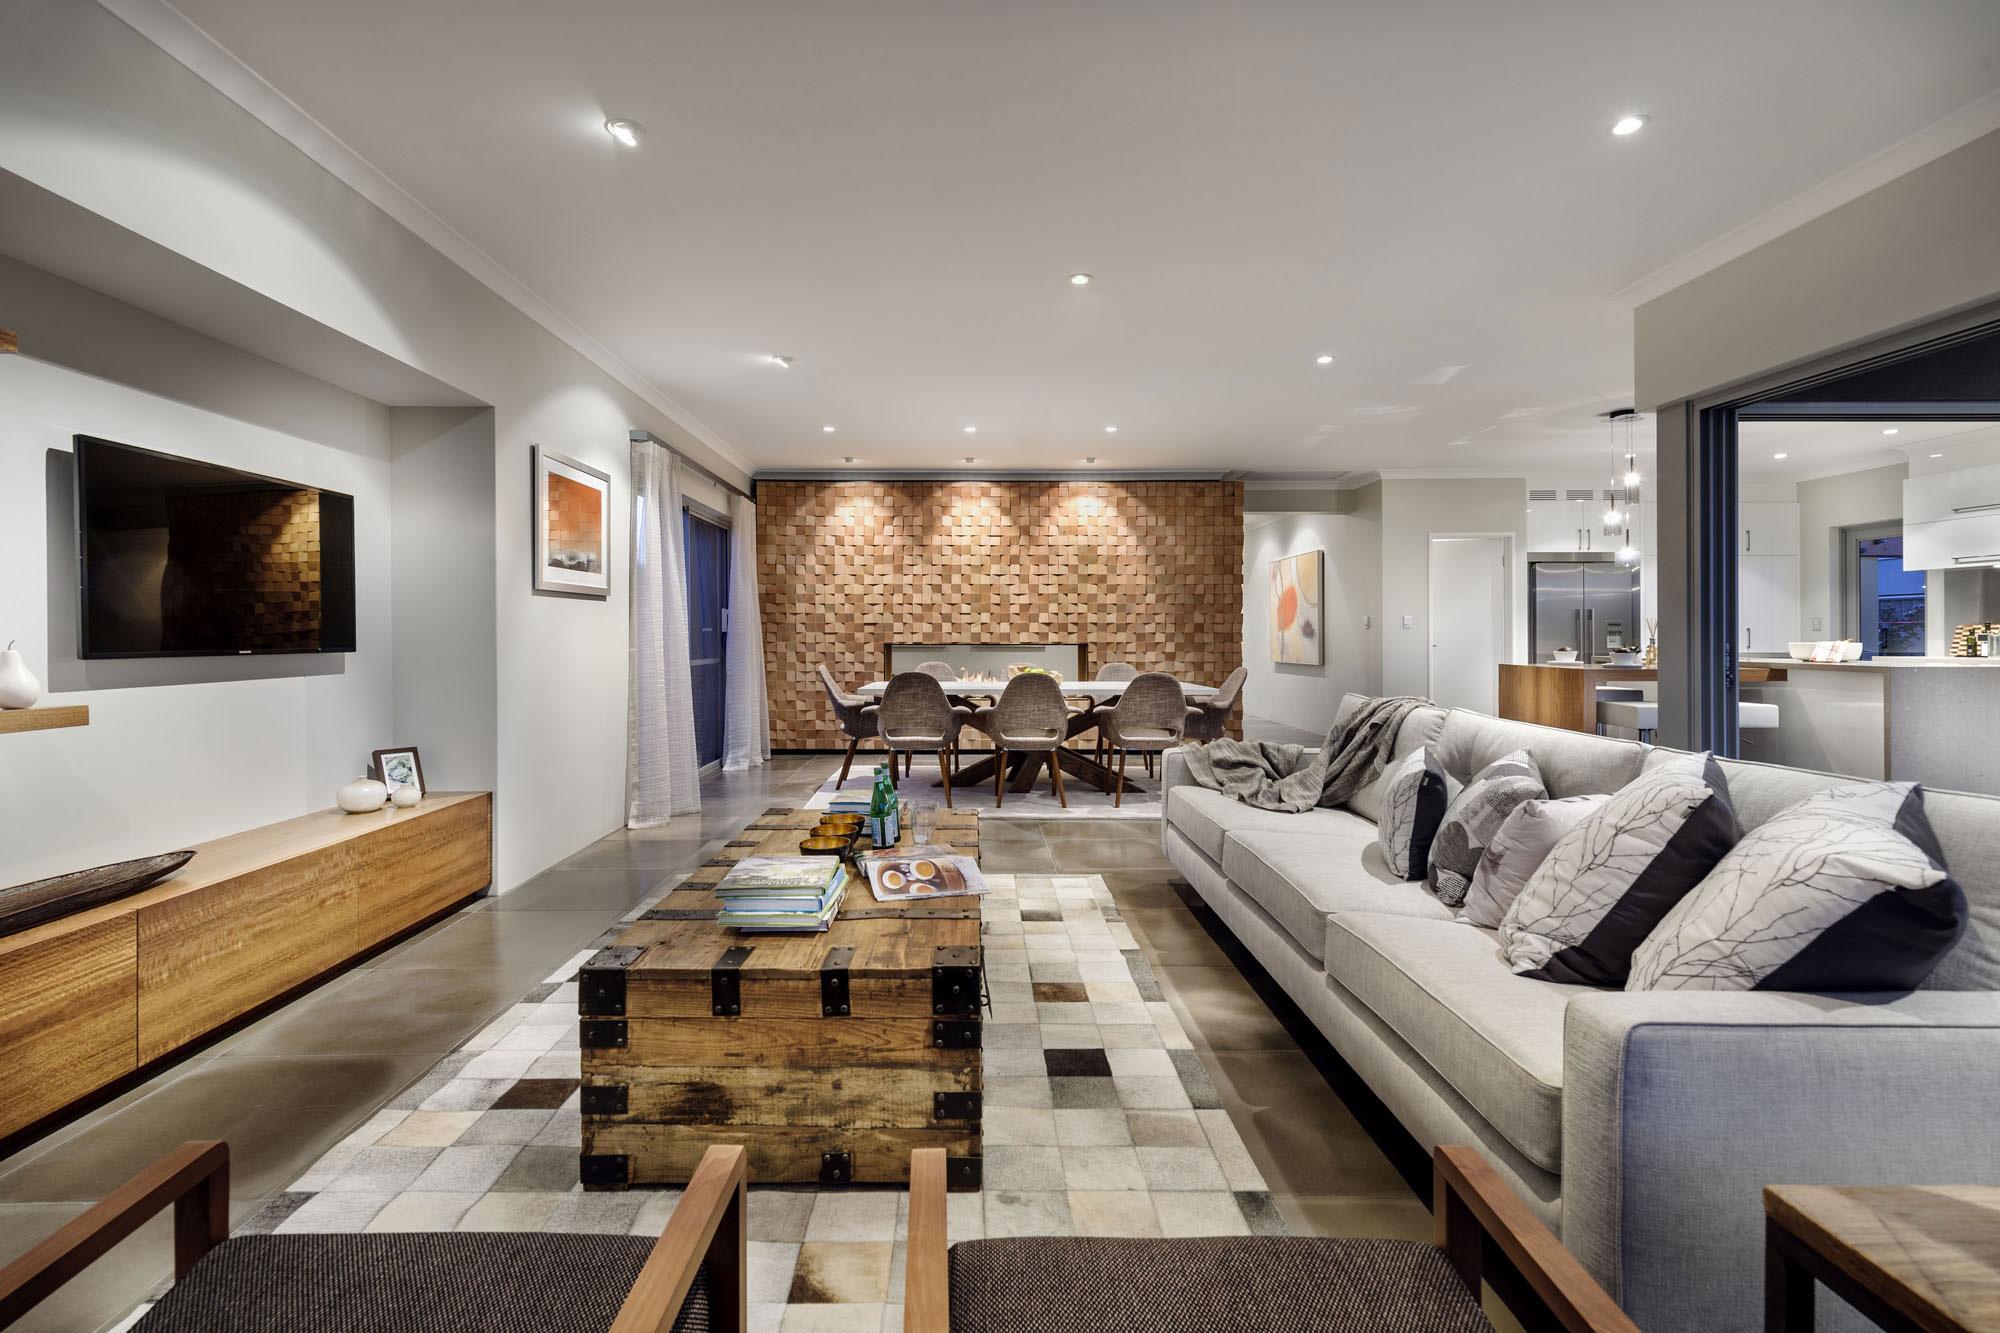 Stylish Modern Home in Wandi, Perth, Australia